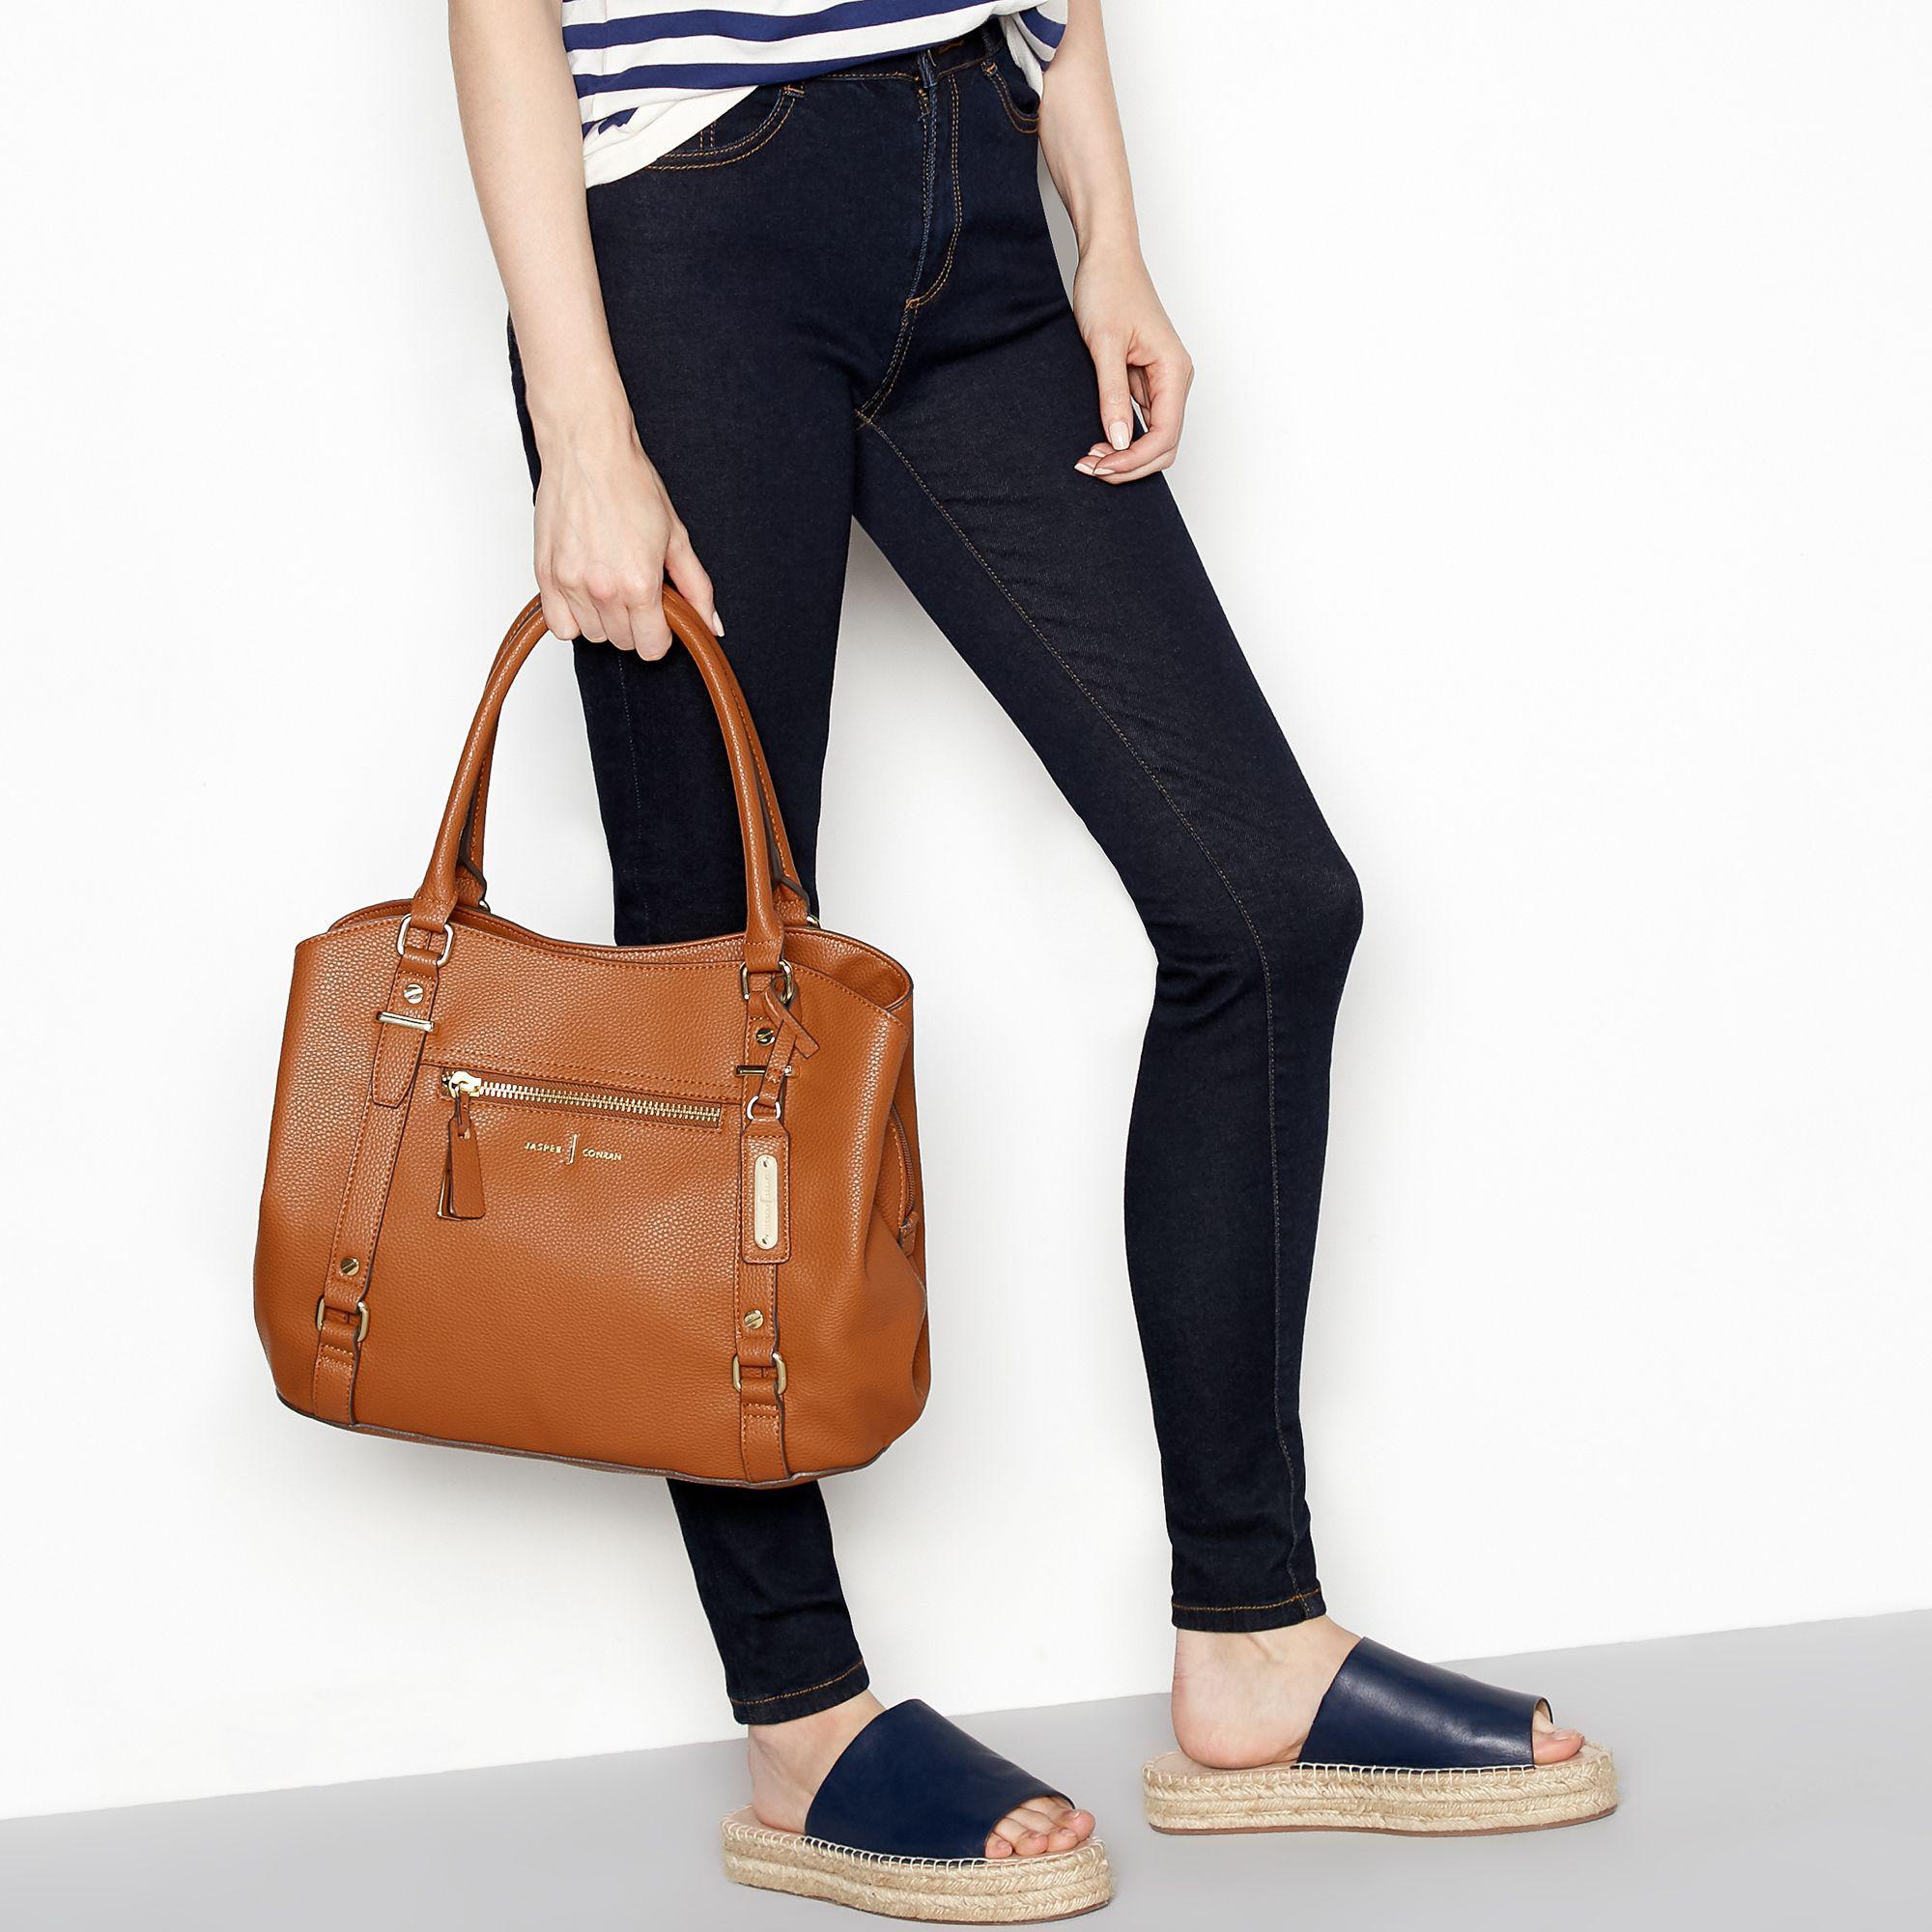 d63640a65039 J By Jasper Conran - Brown Tan Zip Detail Hobo Shoulder Bag - Lyst. View  fullscreen